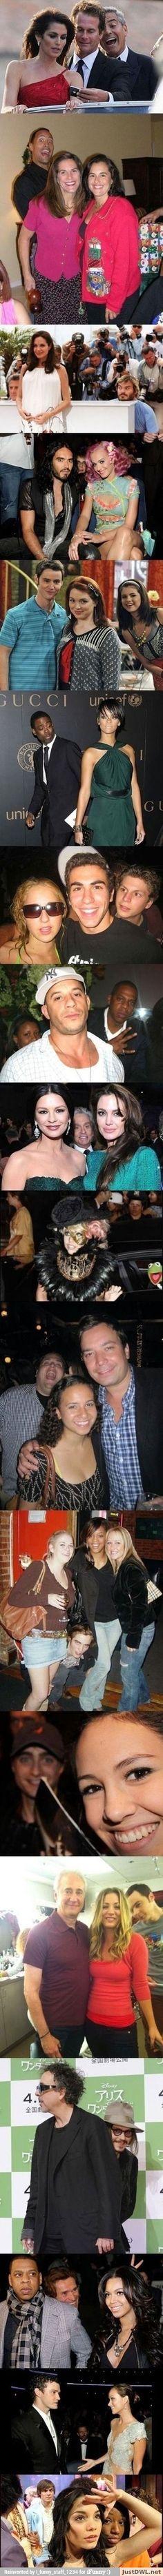 Celebrity Photo boom